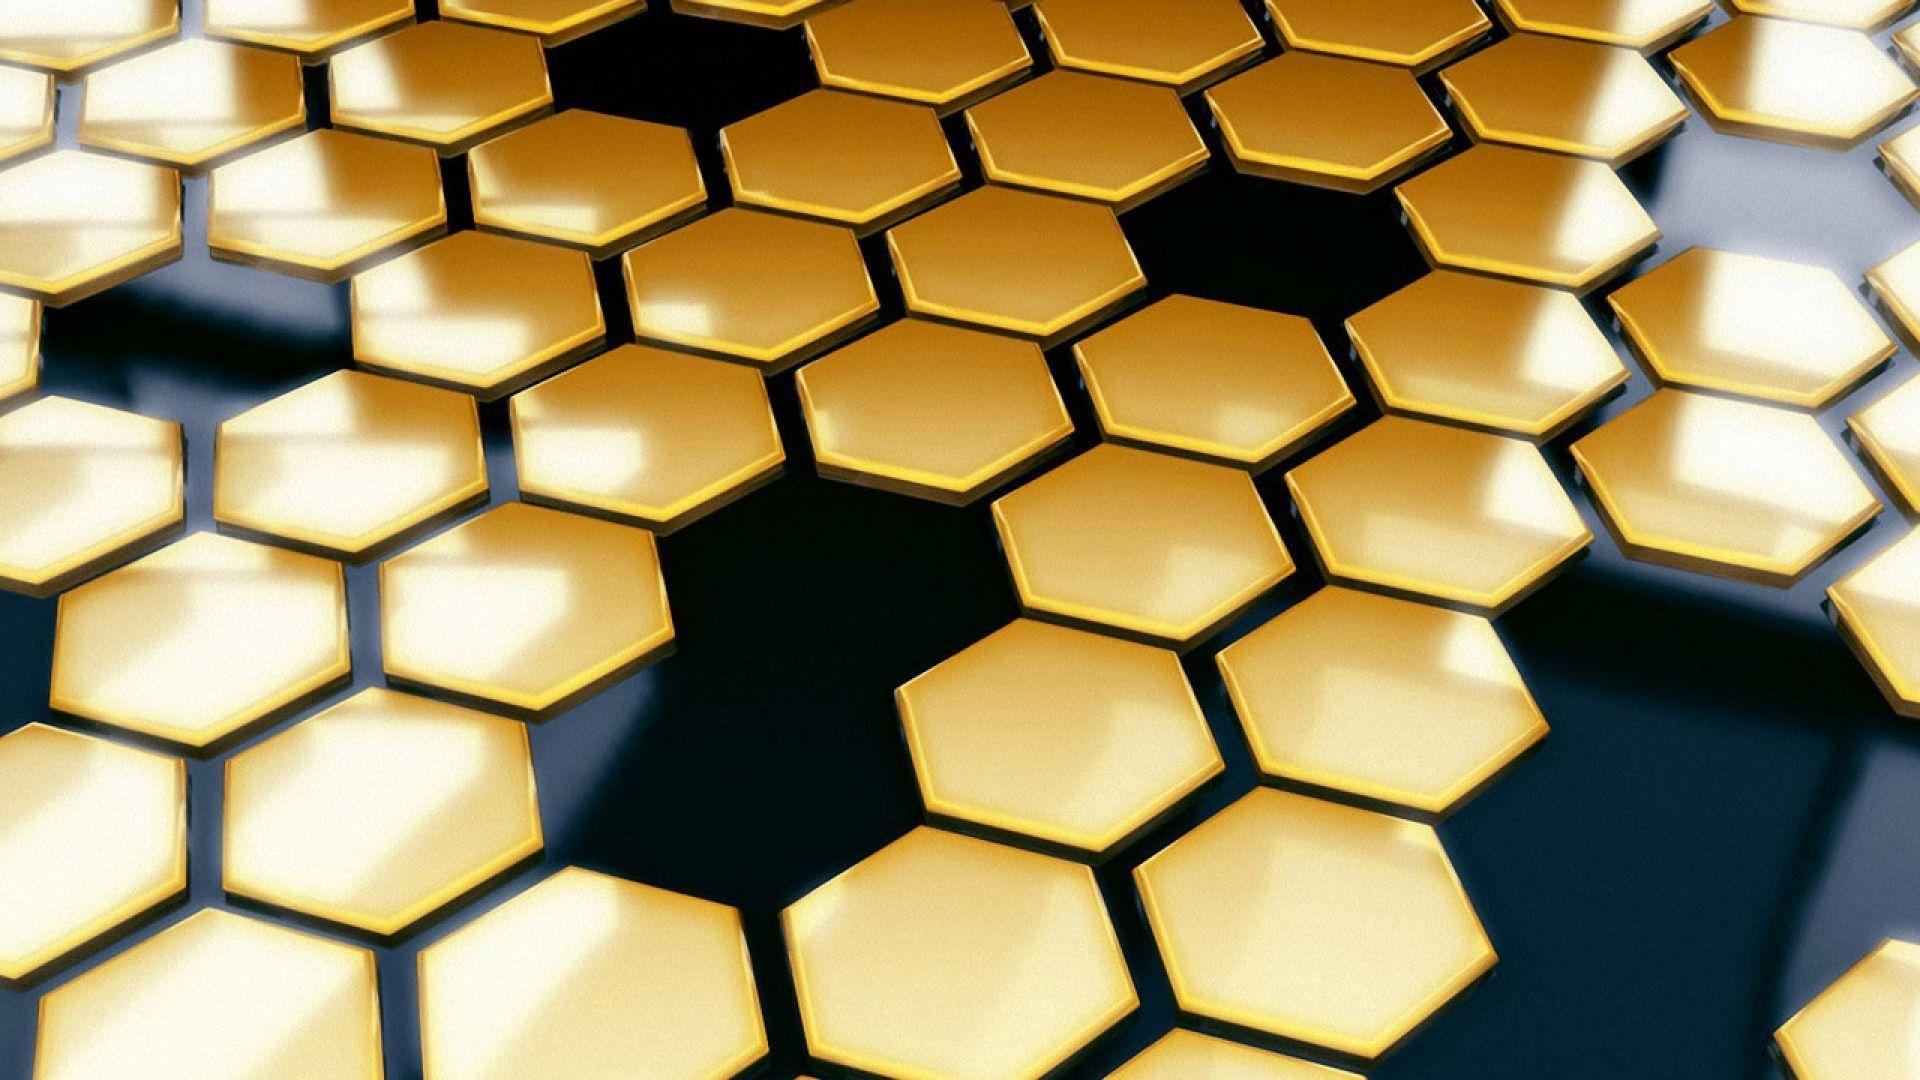 Download Wallpaper 1920x1080 Honeycomb Bees Black Yellow Full Hd 1080p Hd Background Honeycomb Wallpaper Hexagon Wallpaper Honeycomb